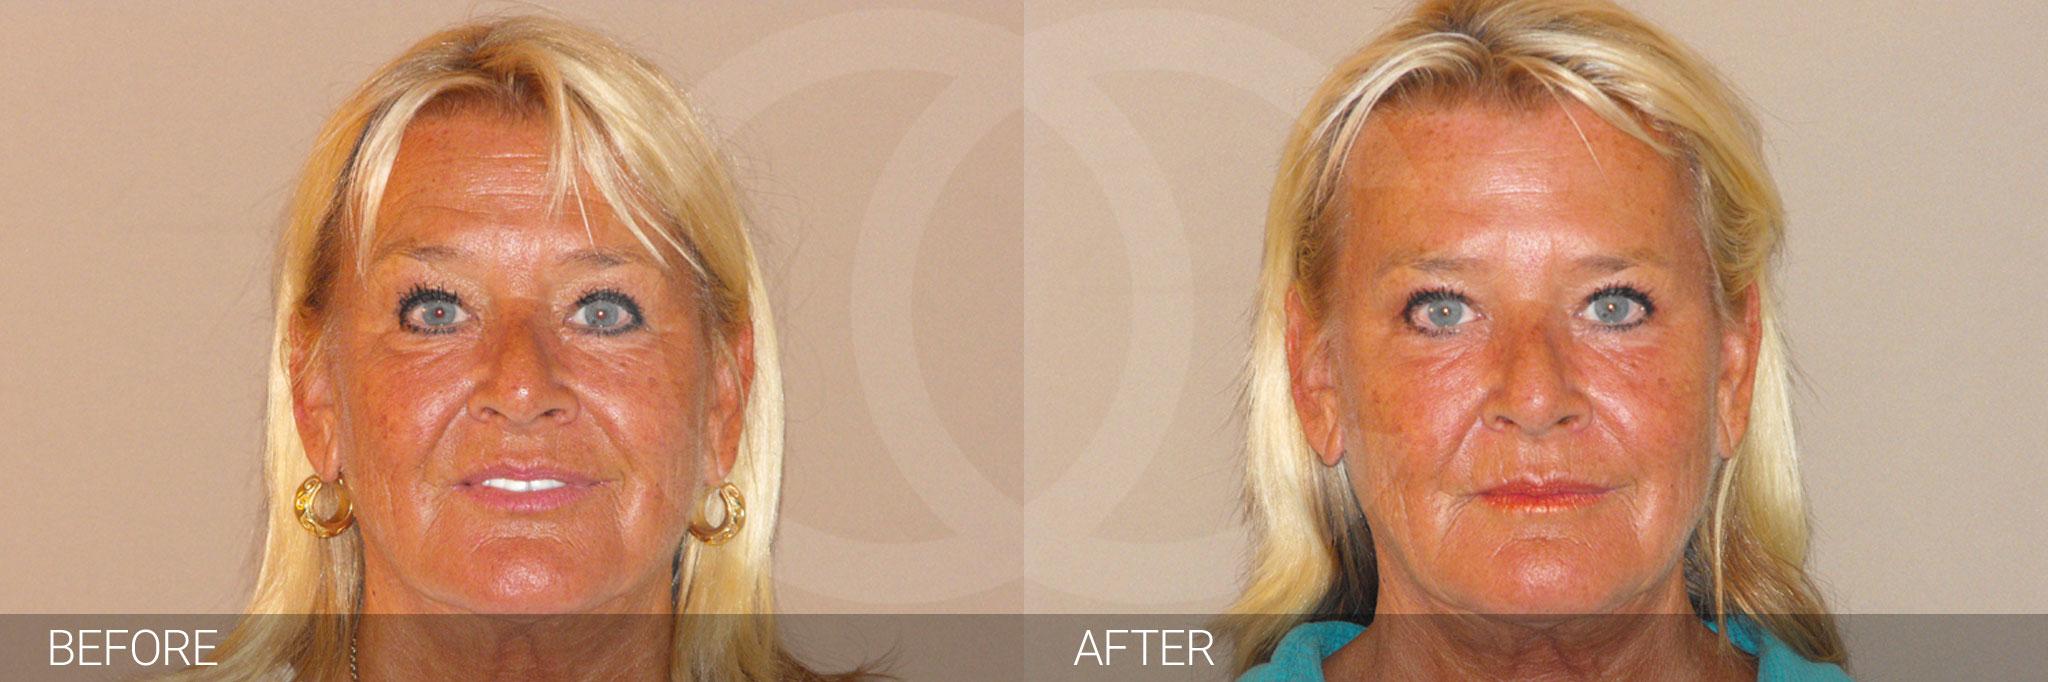 Botox - Botulinum Toxin Rejuvenation ante/post-op I